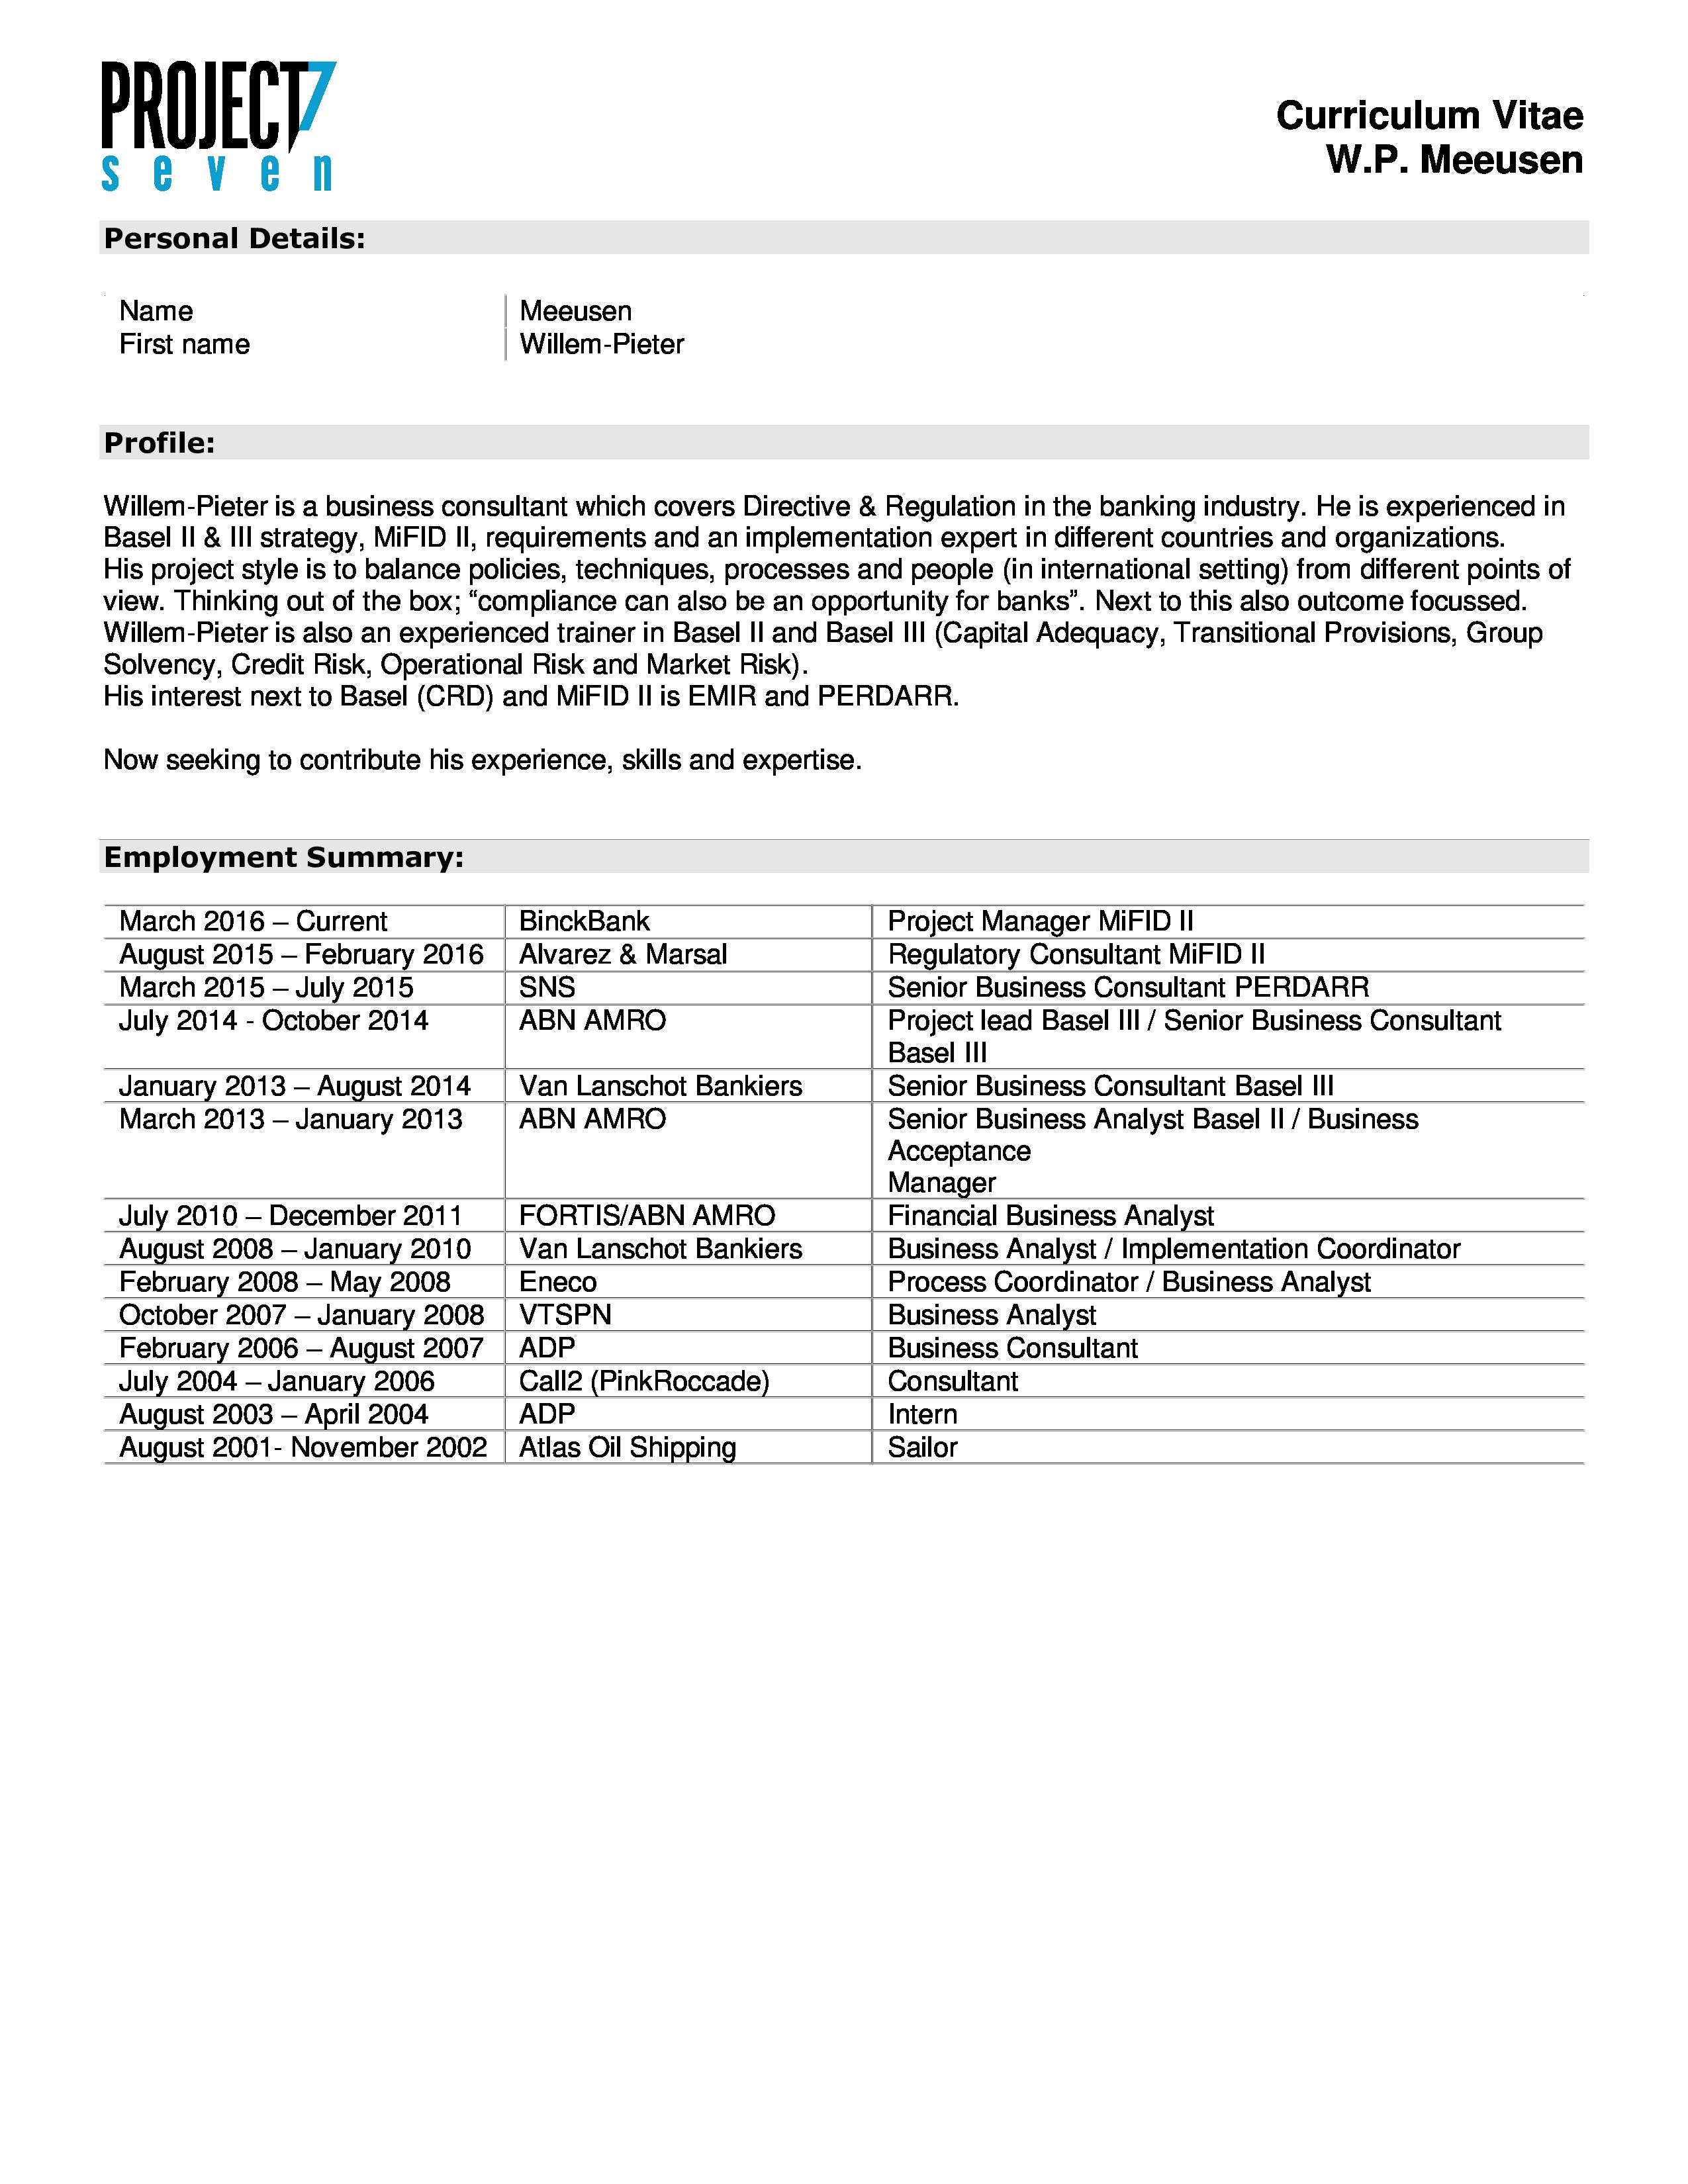 Senior Business Consultant Resume How To Draft A Senior Business Consultant Resume Download This Senior Business Consul Consulting Business Templates Resume